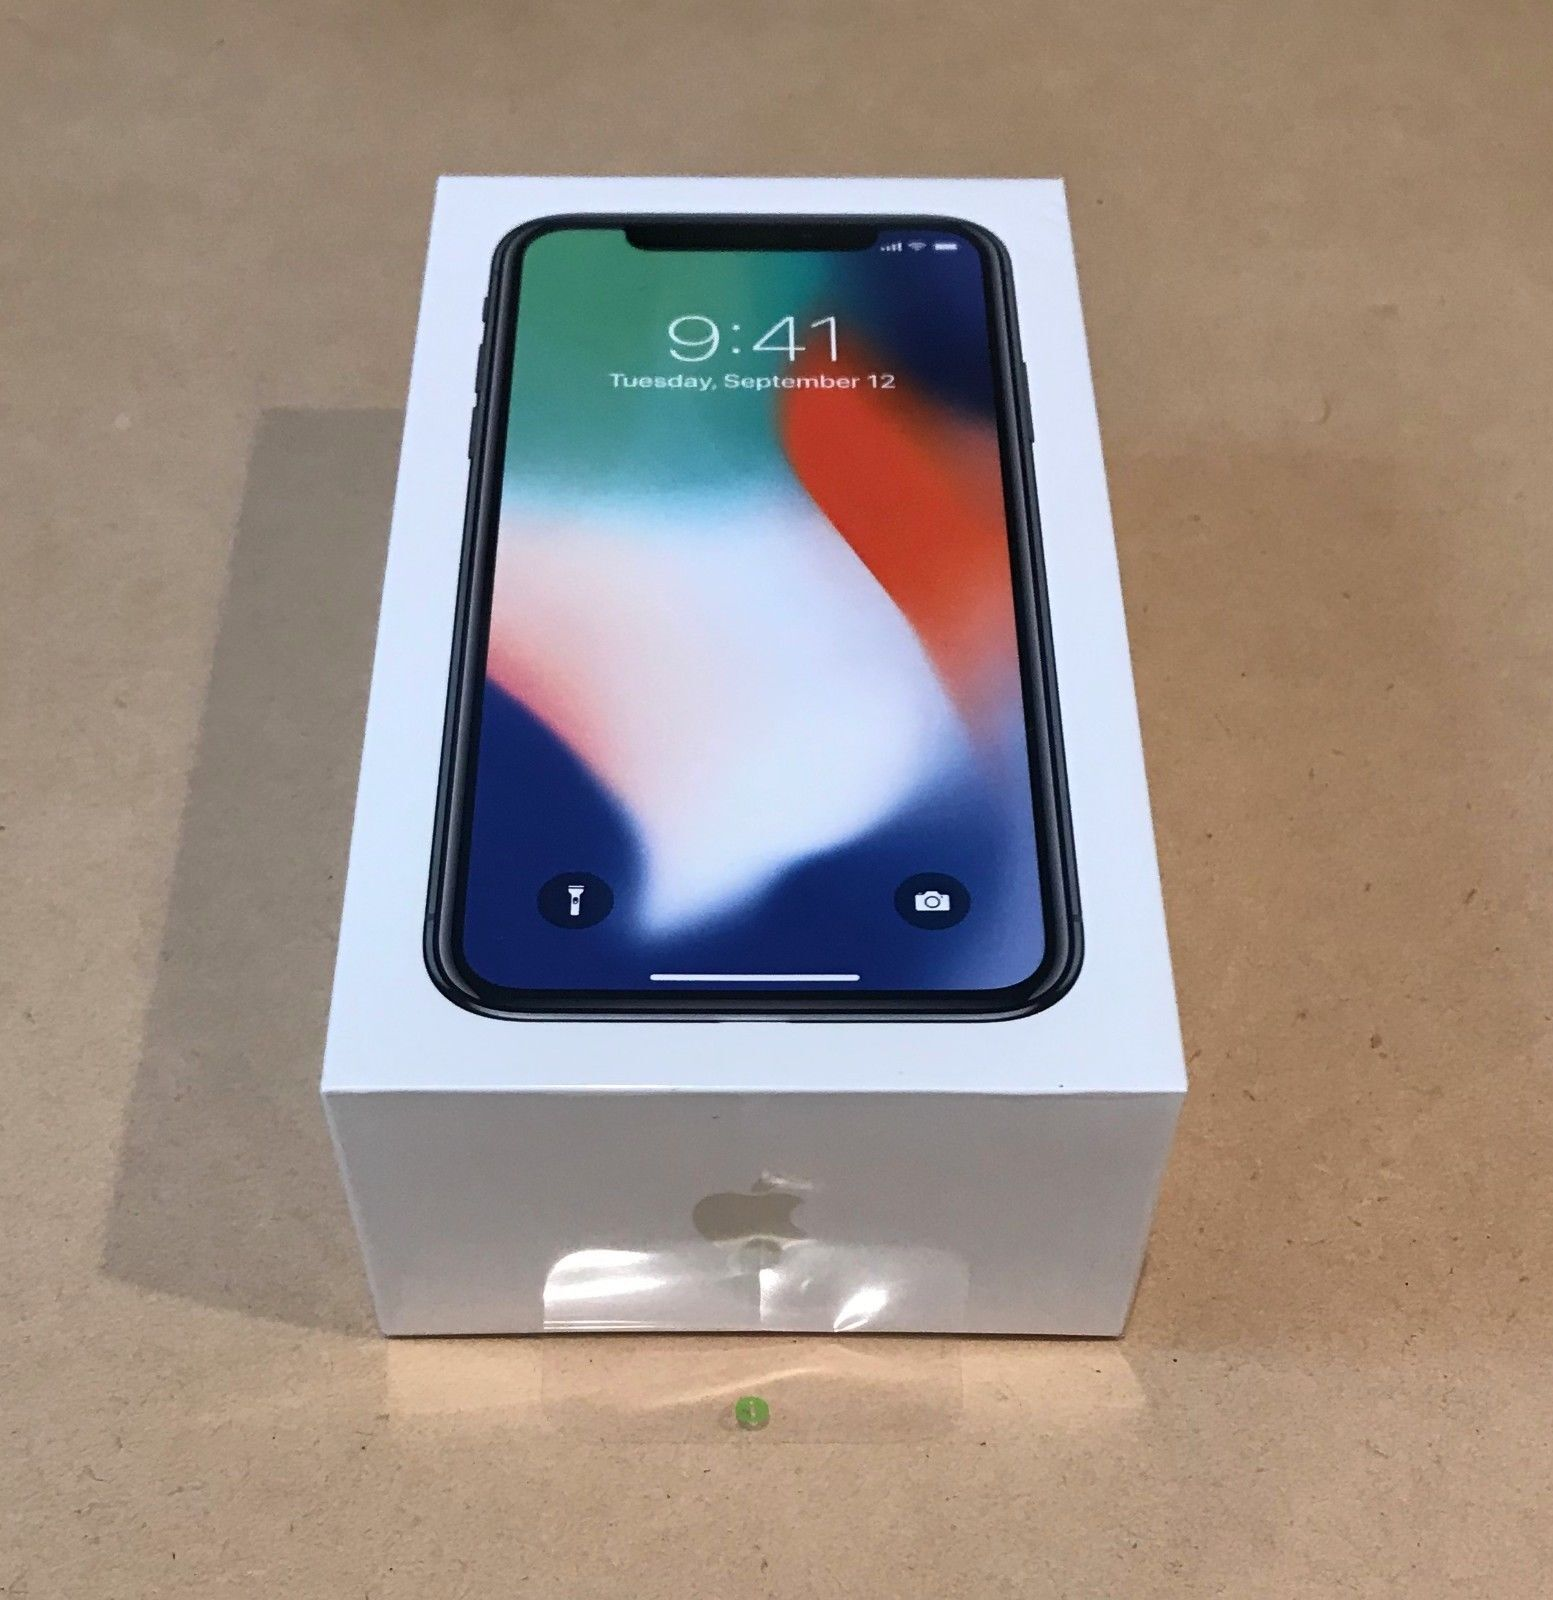 Apple X  iPhonx 10 ten 256GB factory unlocked verizon A1865 ready to ship fast